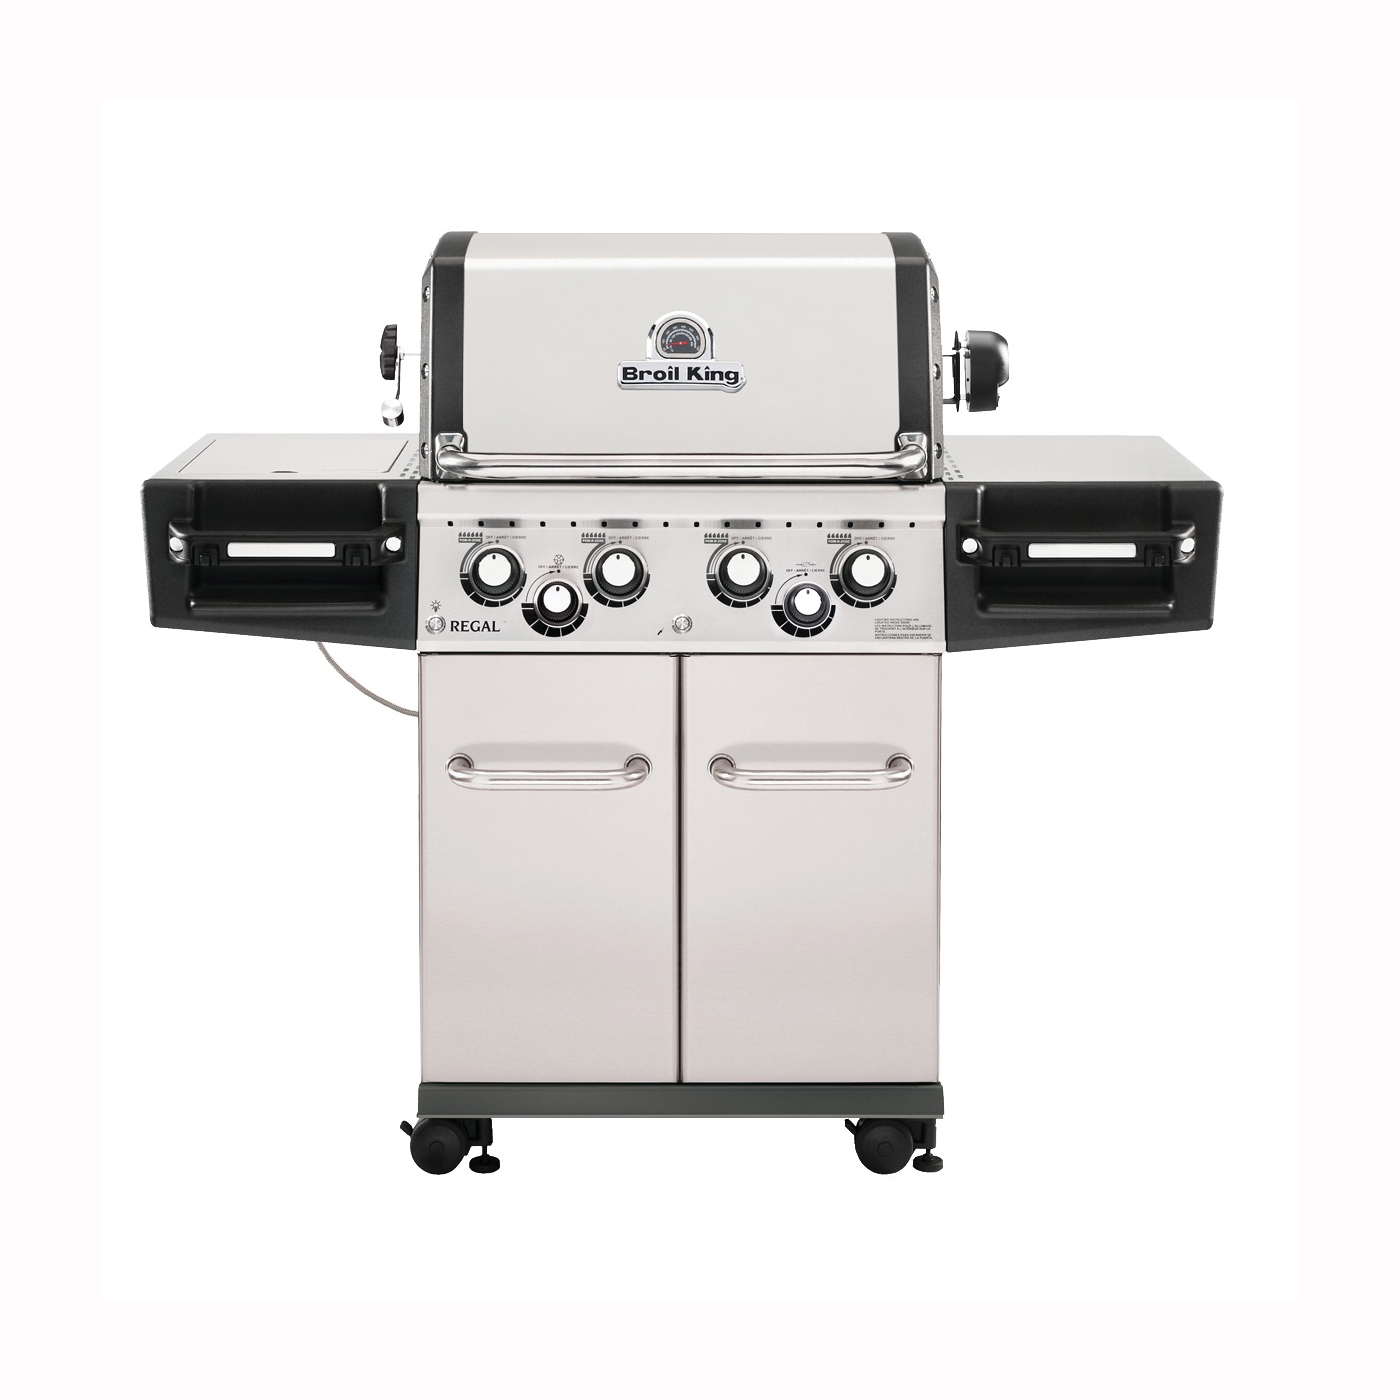 Picture of Broil King Regal 956344 Gas Grill, 55000 Btu/hr BTU, Liquid Propane, 4 -Burner, 500 sq-in Primary Cooking Surface